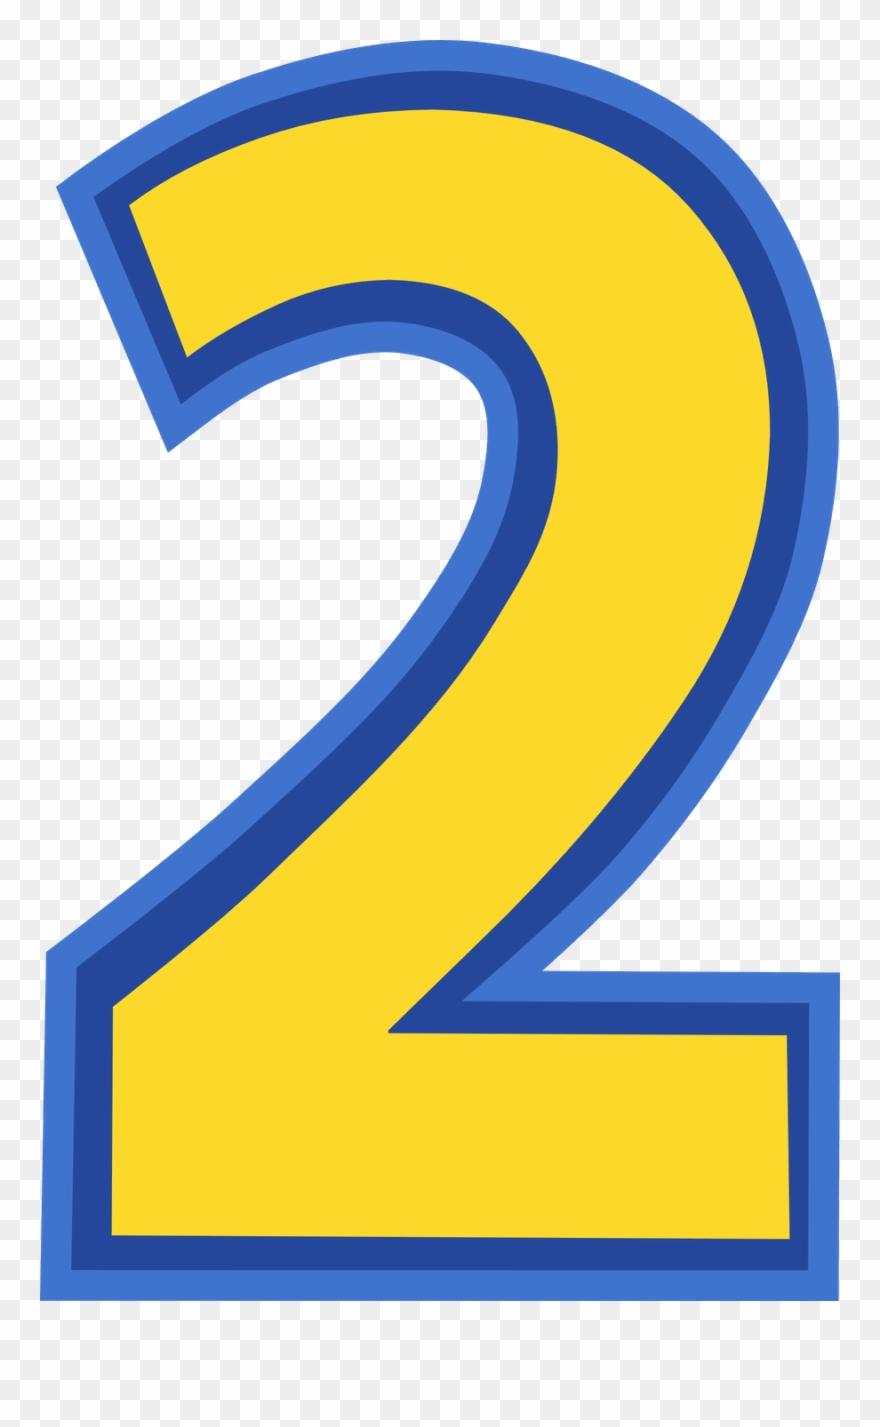 Minus Fiesta De Toy Story, Fiesta 2, Numero 24,.